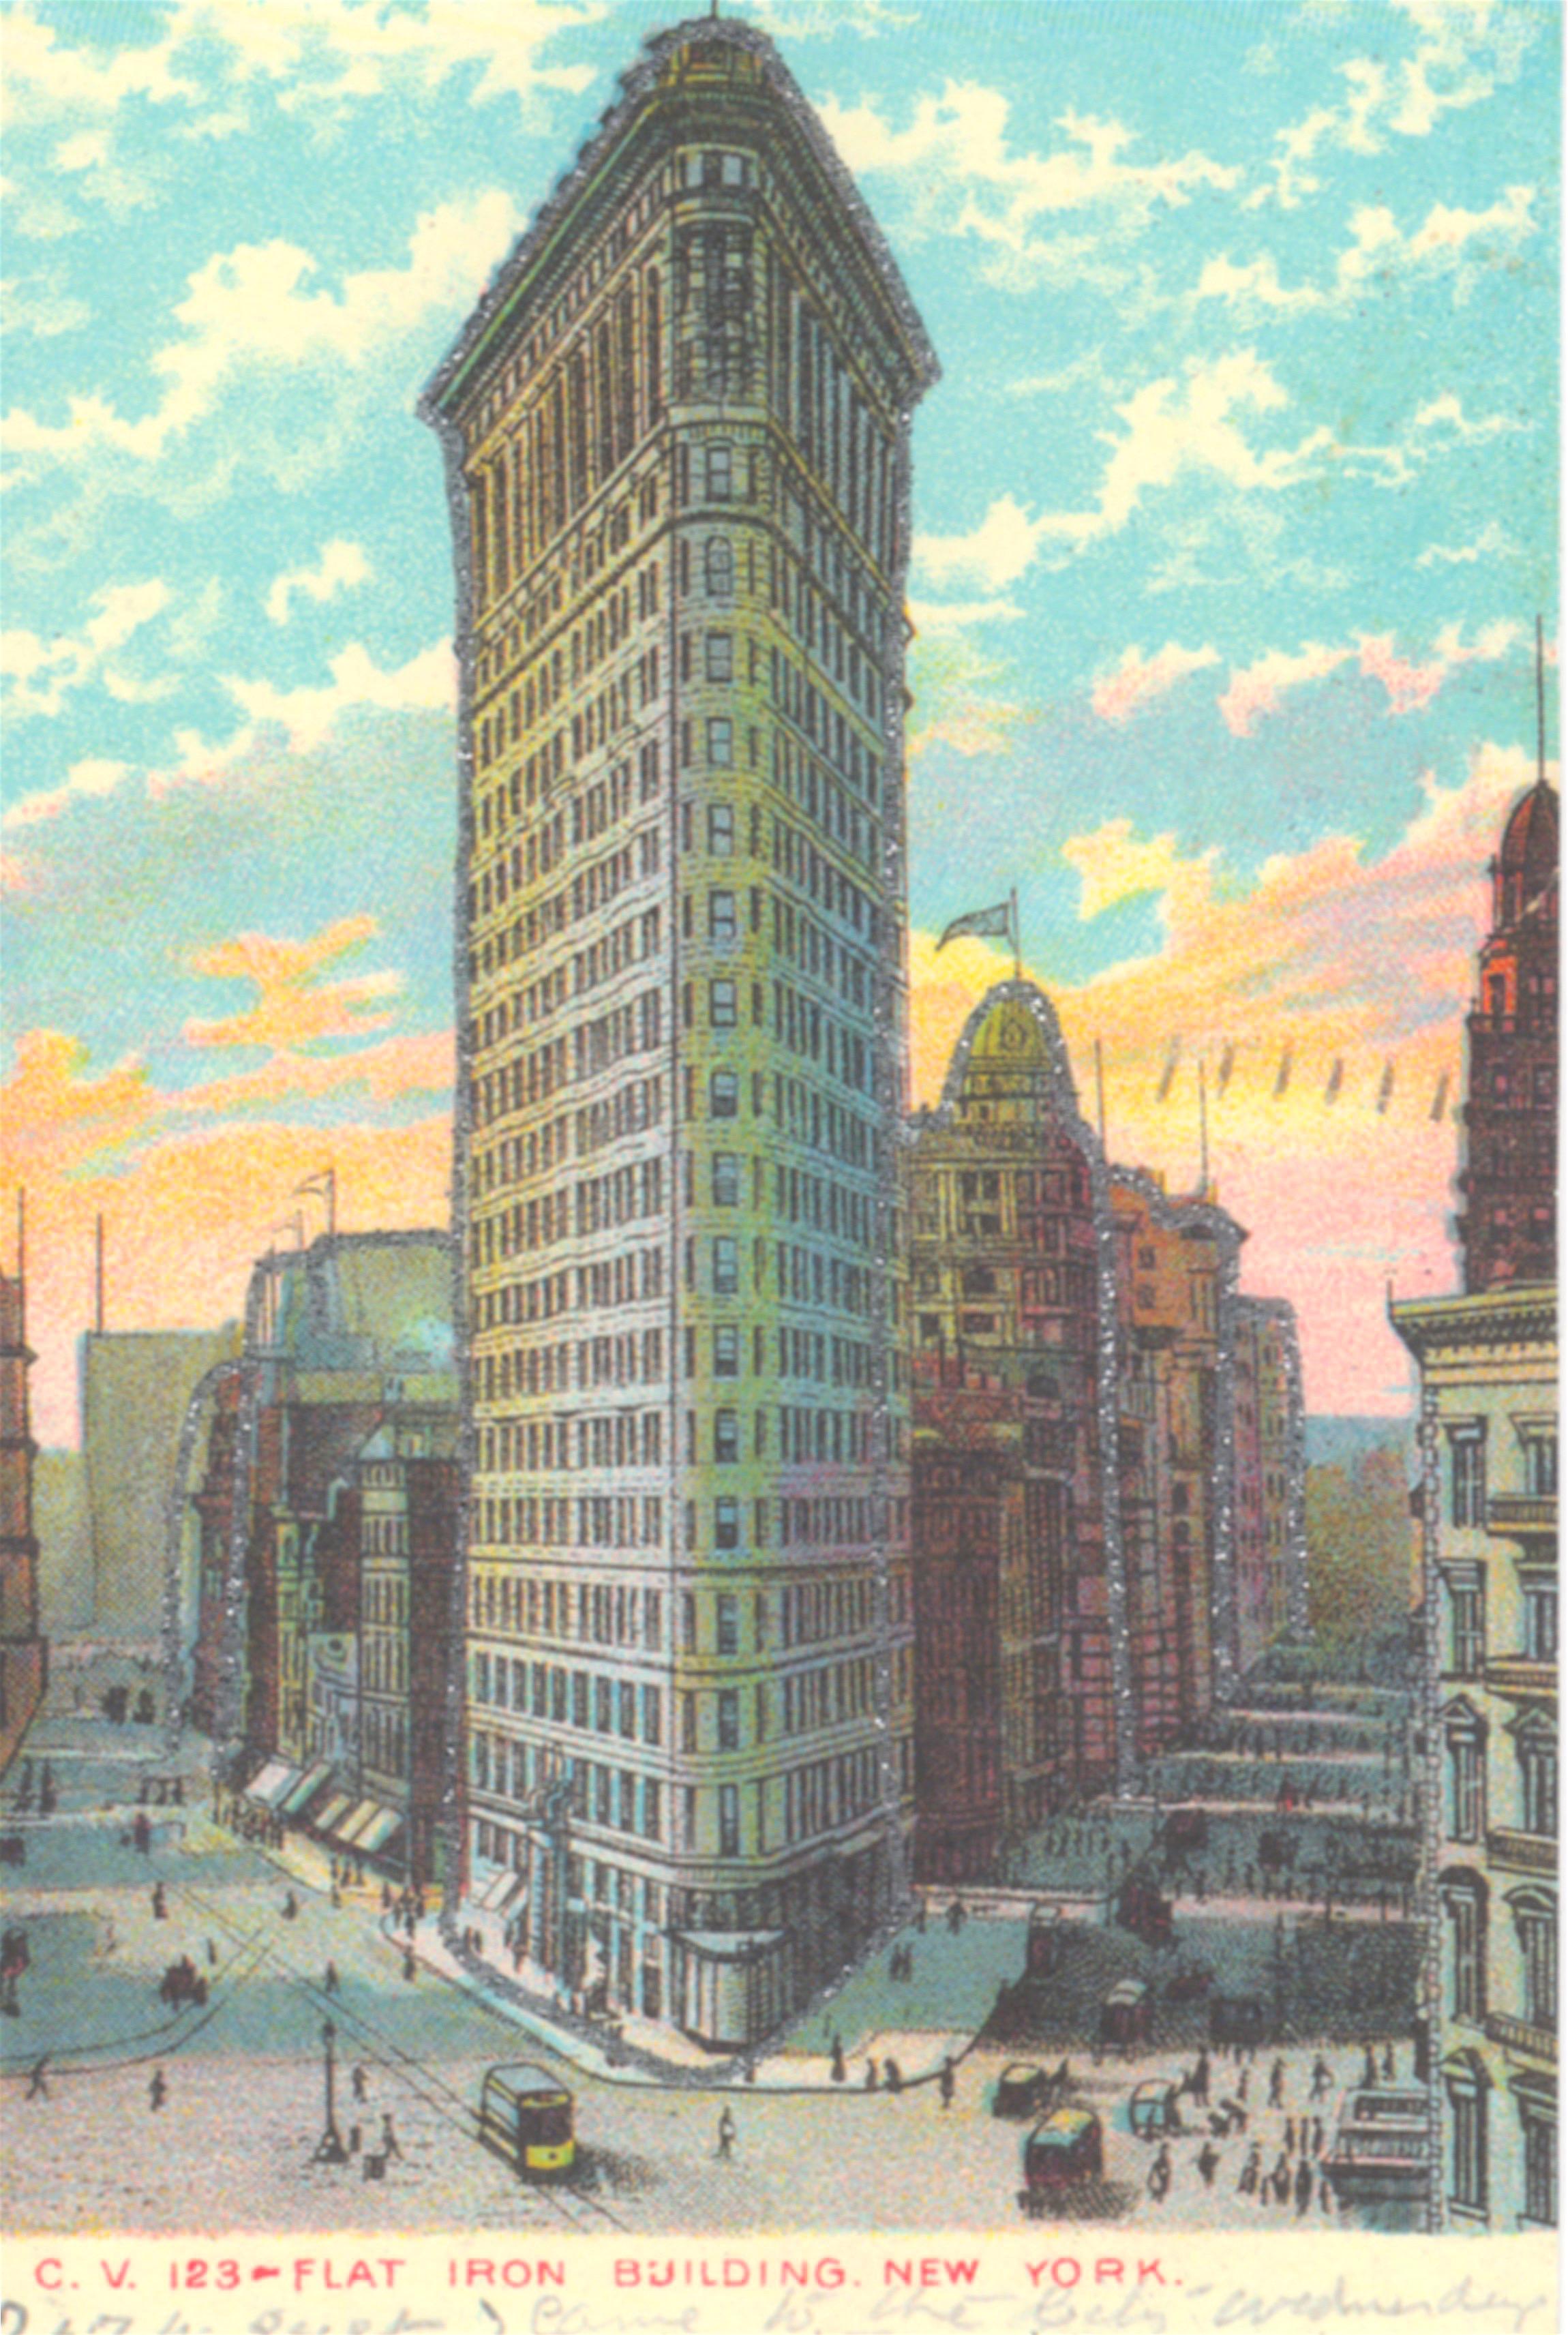 Flatiron Building. Skyscraper in Manhattan: address, description